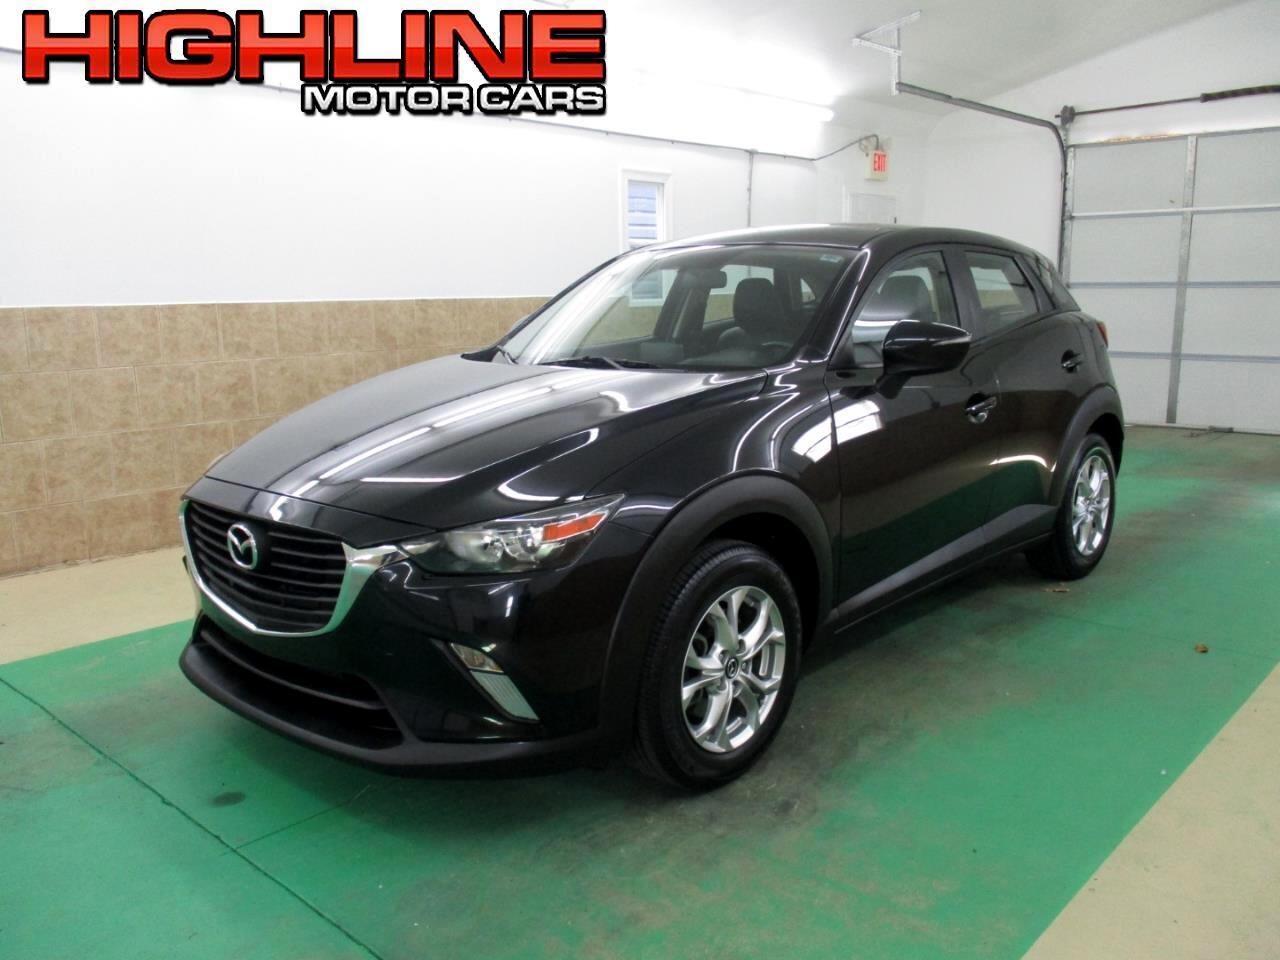 2016 Mazda CX-3 AWD 4dr Touring